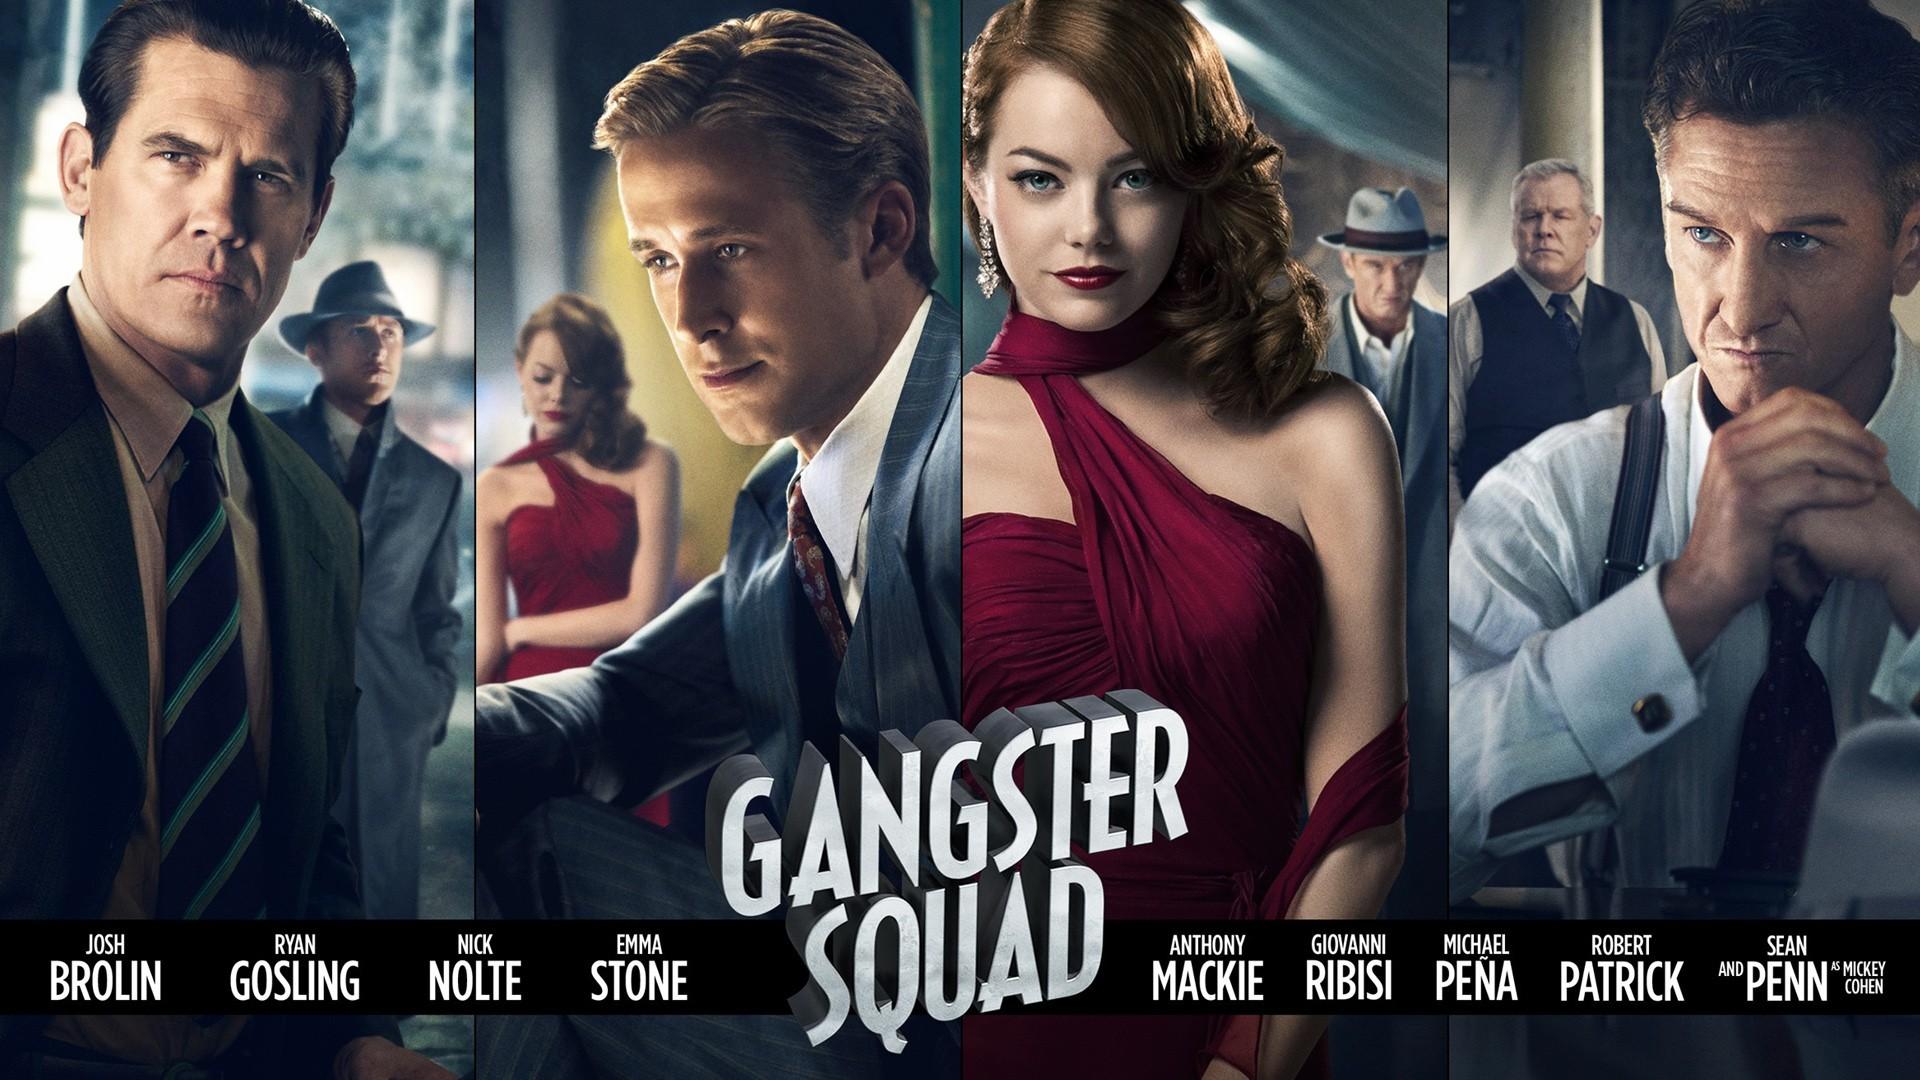 Description: Download Gangster Squad 2013 Movie Movies wallpaper …